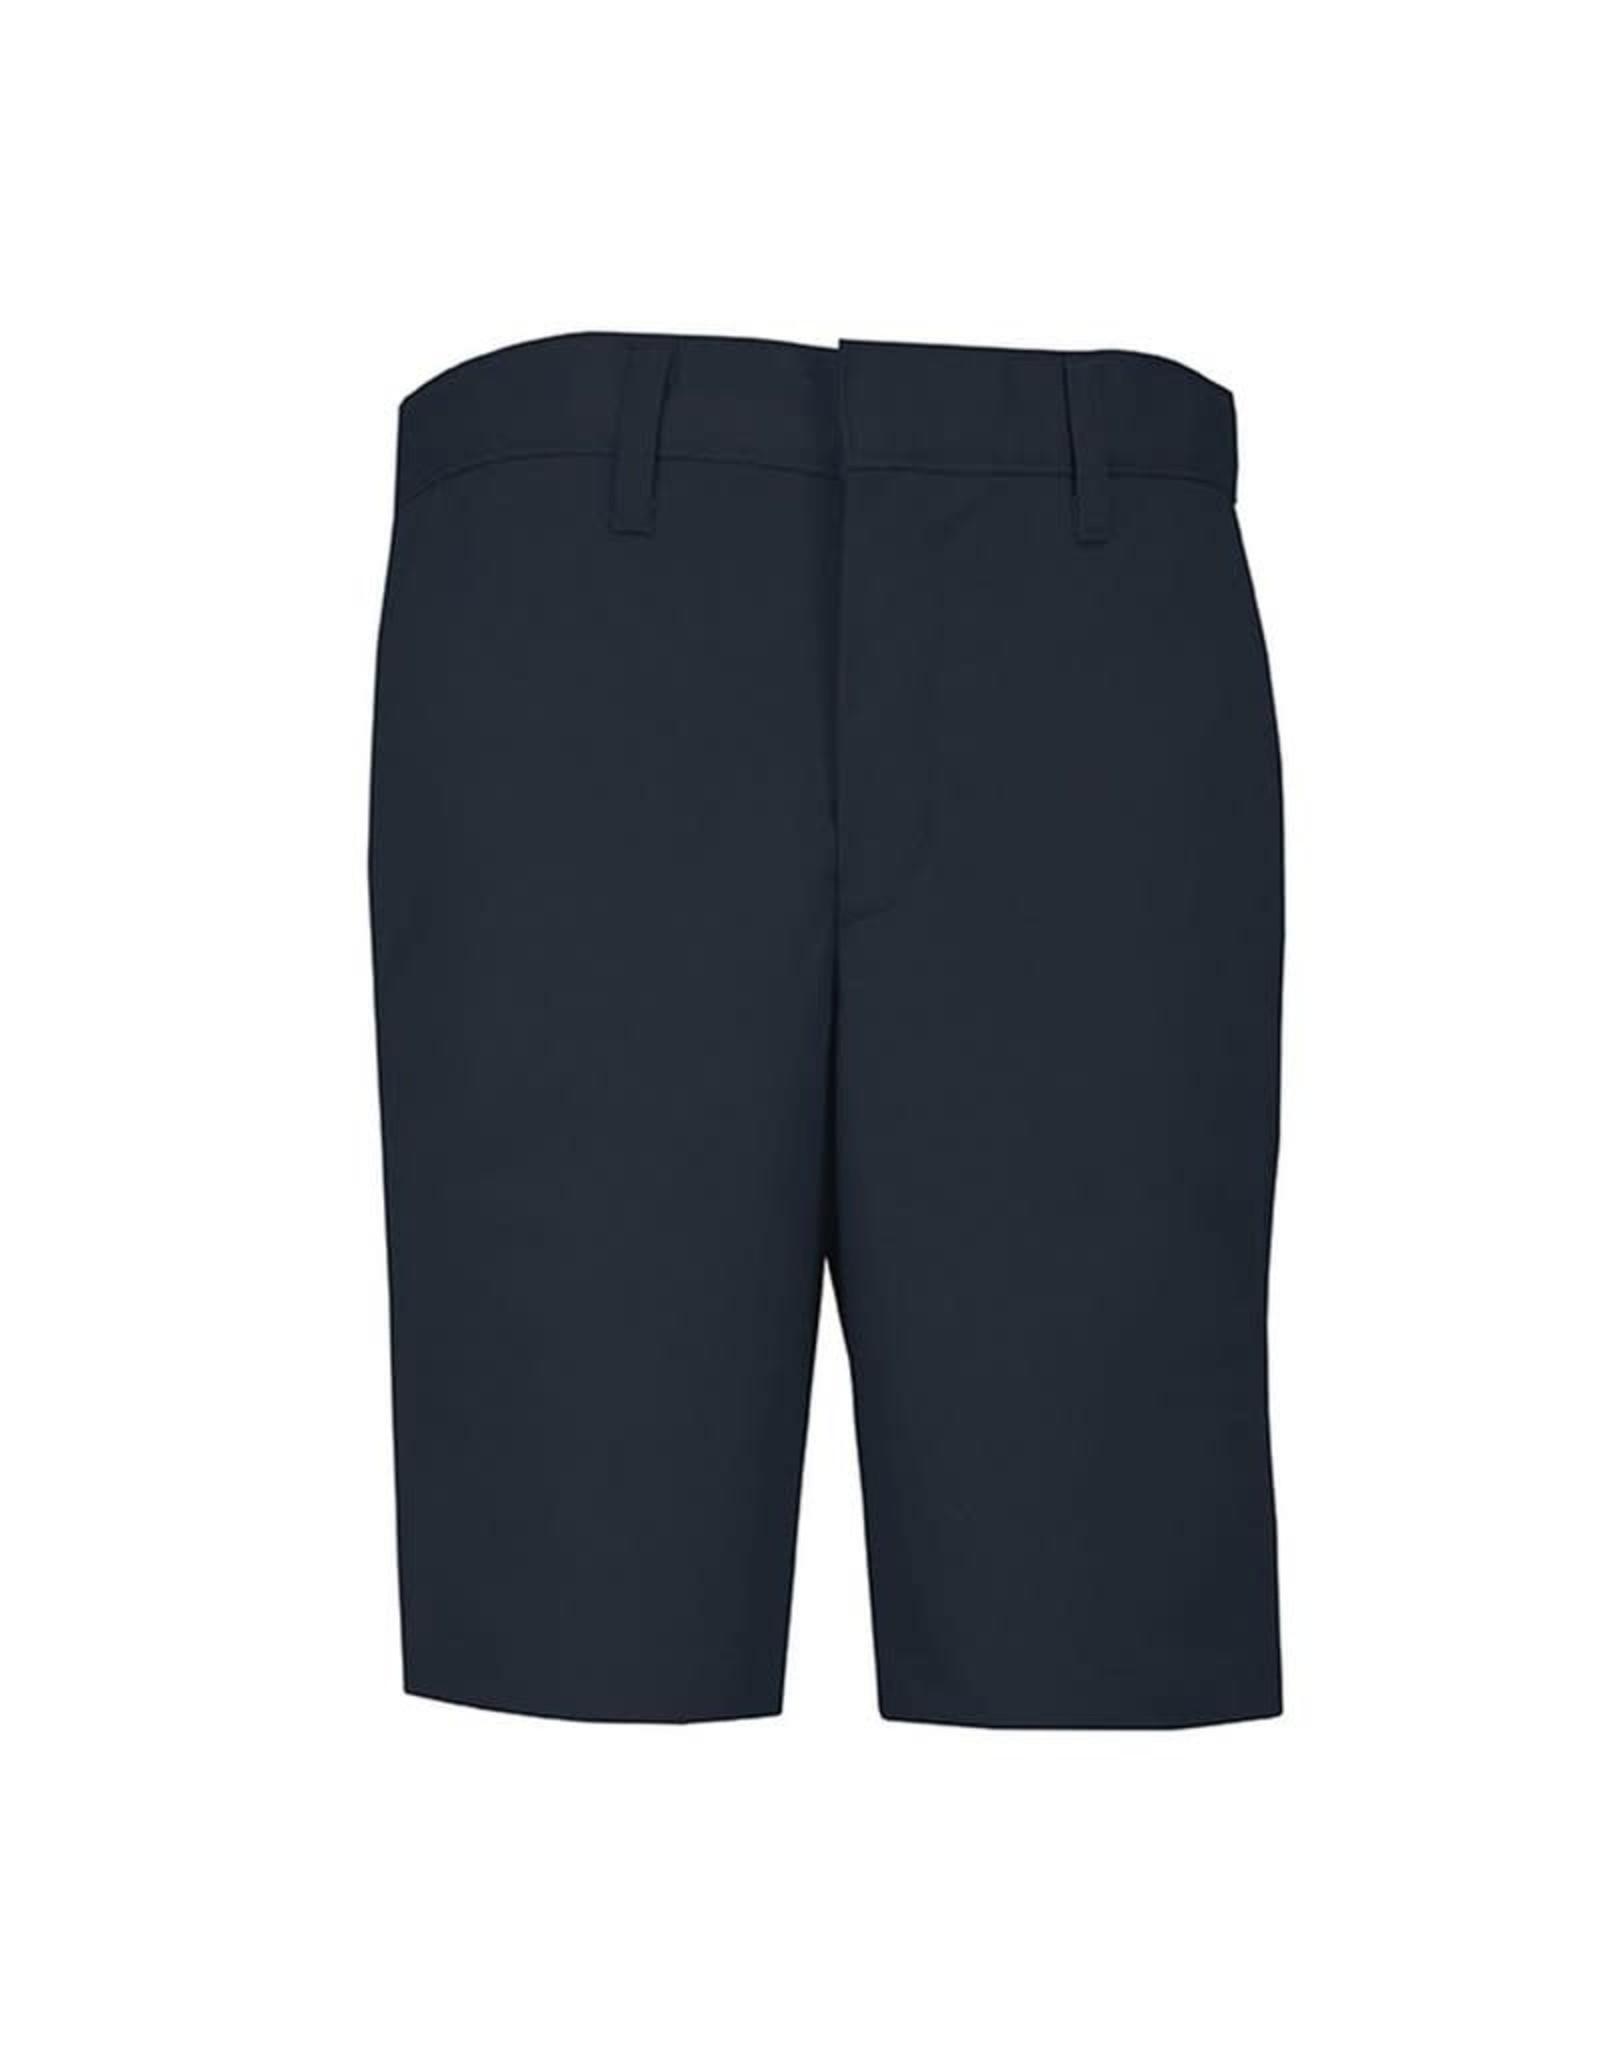 UNIFORM Boys Shorts, New Style